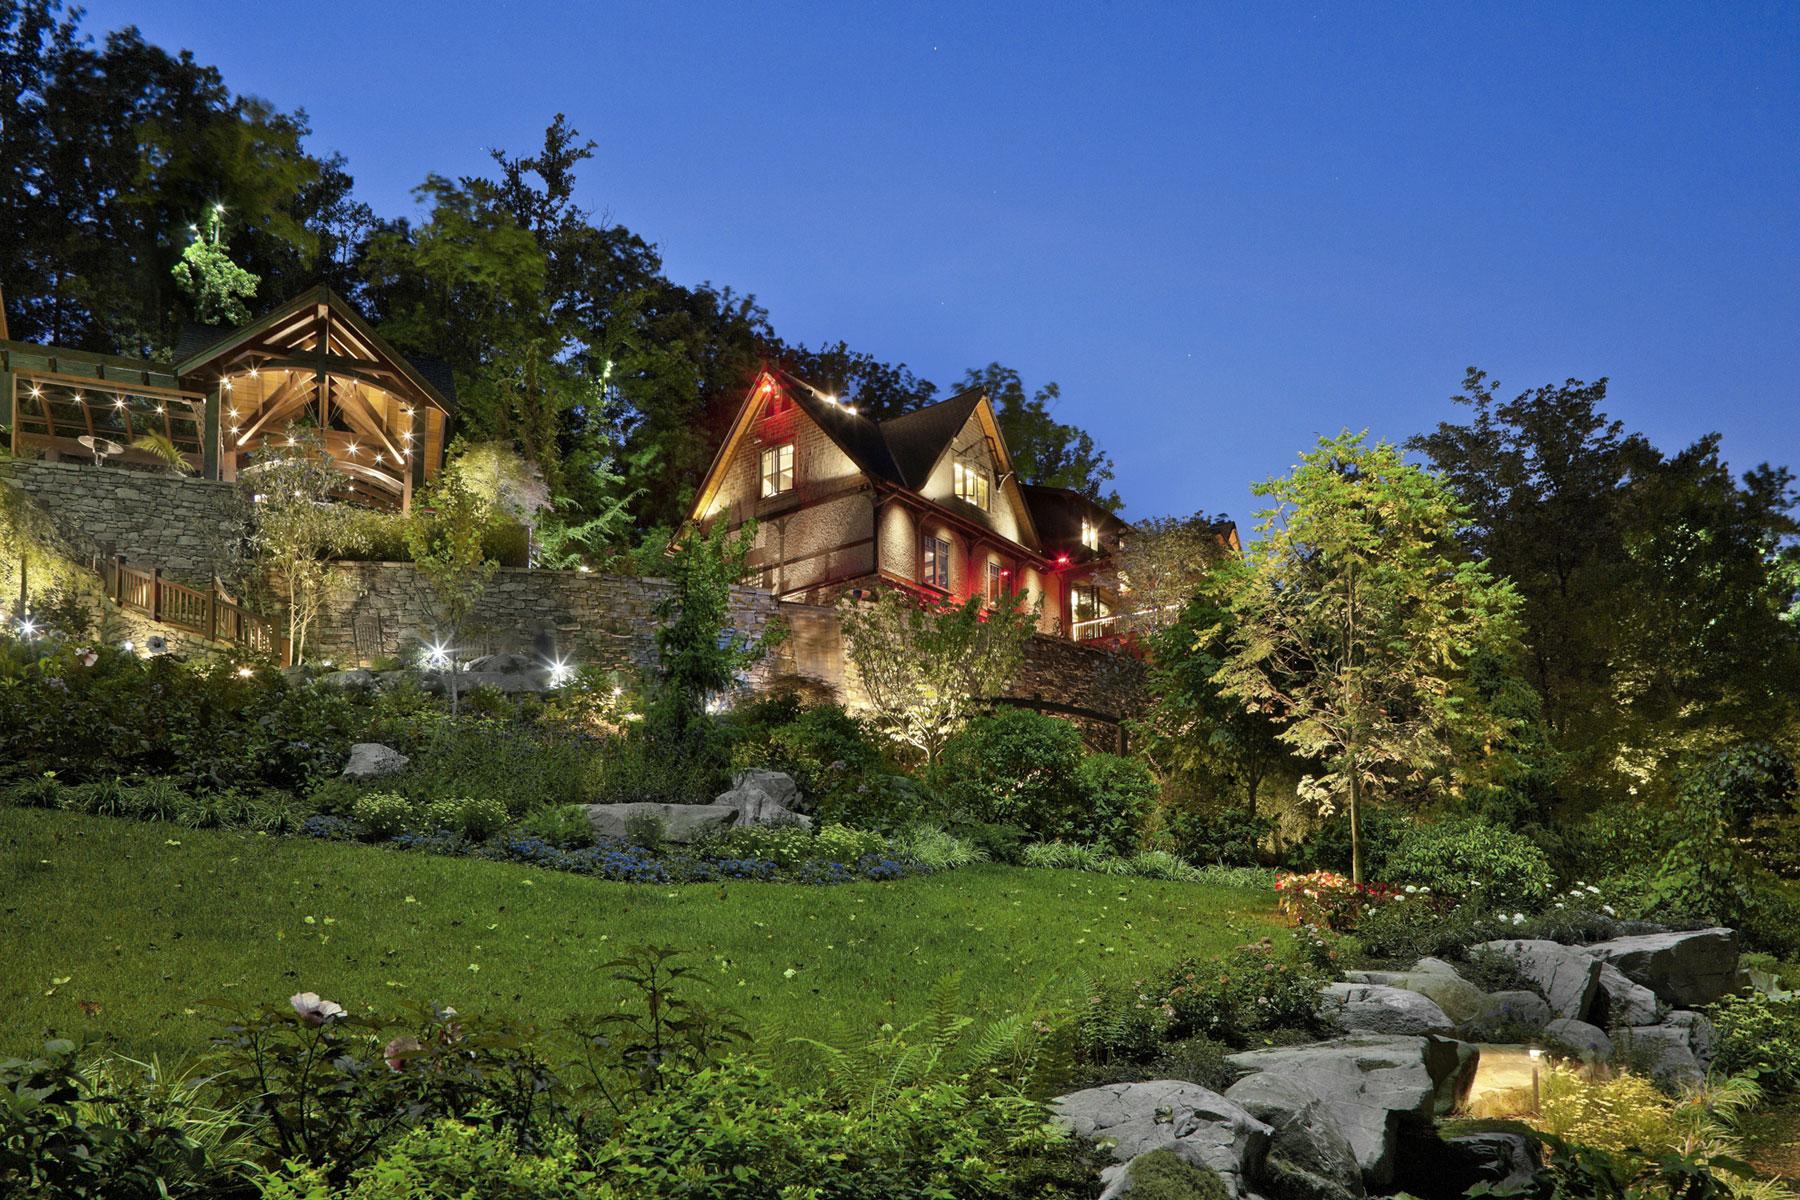 Mountain home nighttime landscape lighting